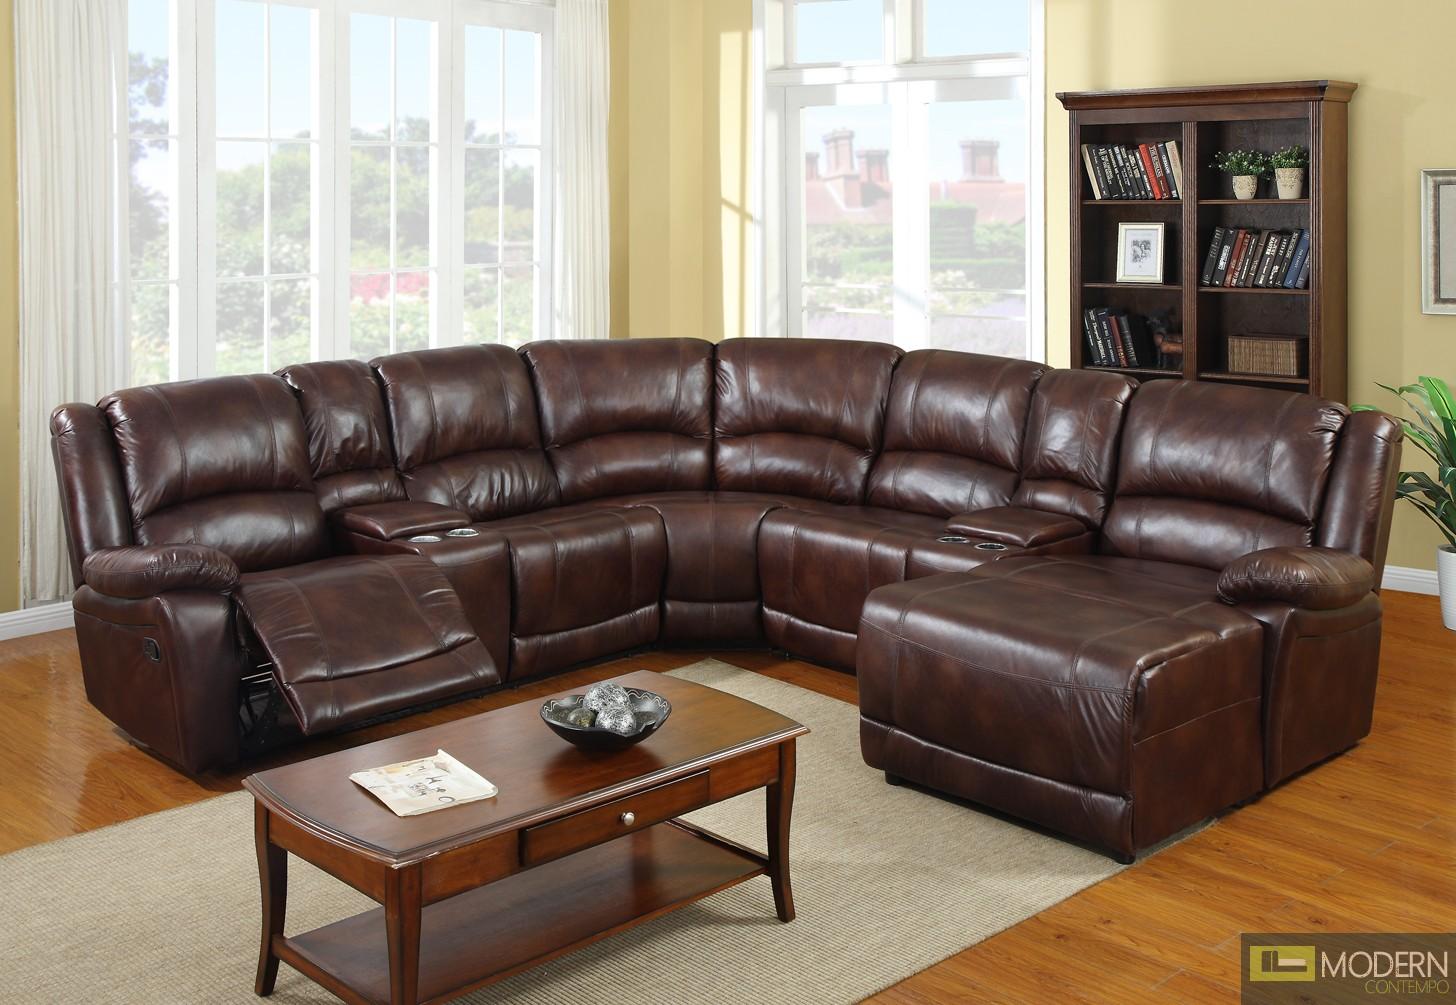 4 Pc Modern Dark Brown Polished Sectional Sofa Living Room Set TBQS9361